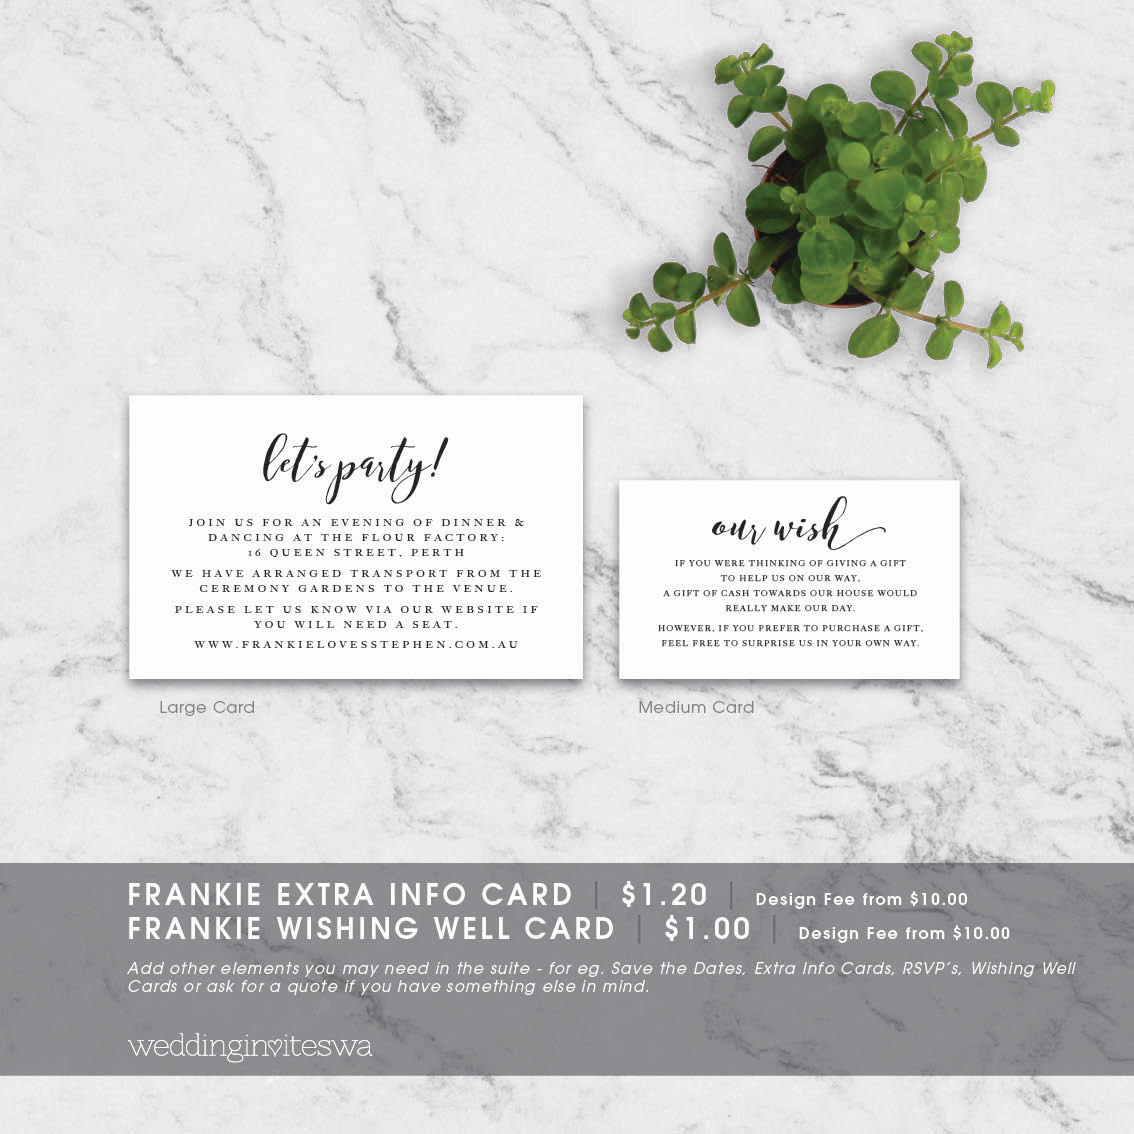 FRANKIE_extra cards